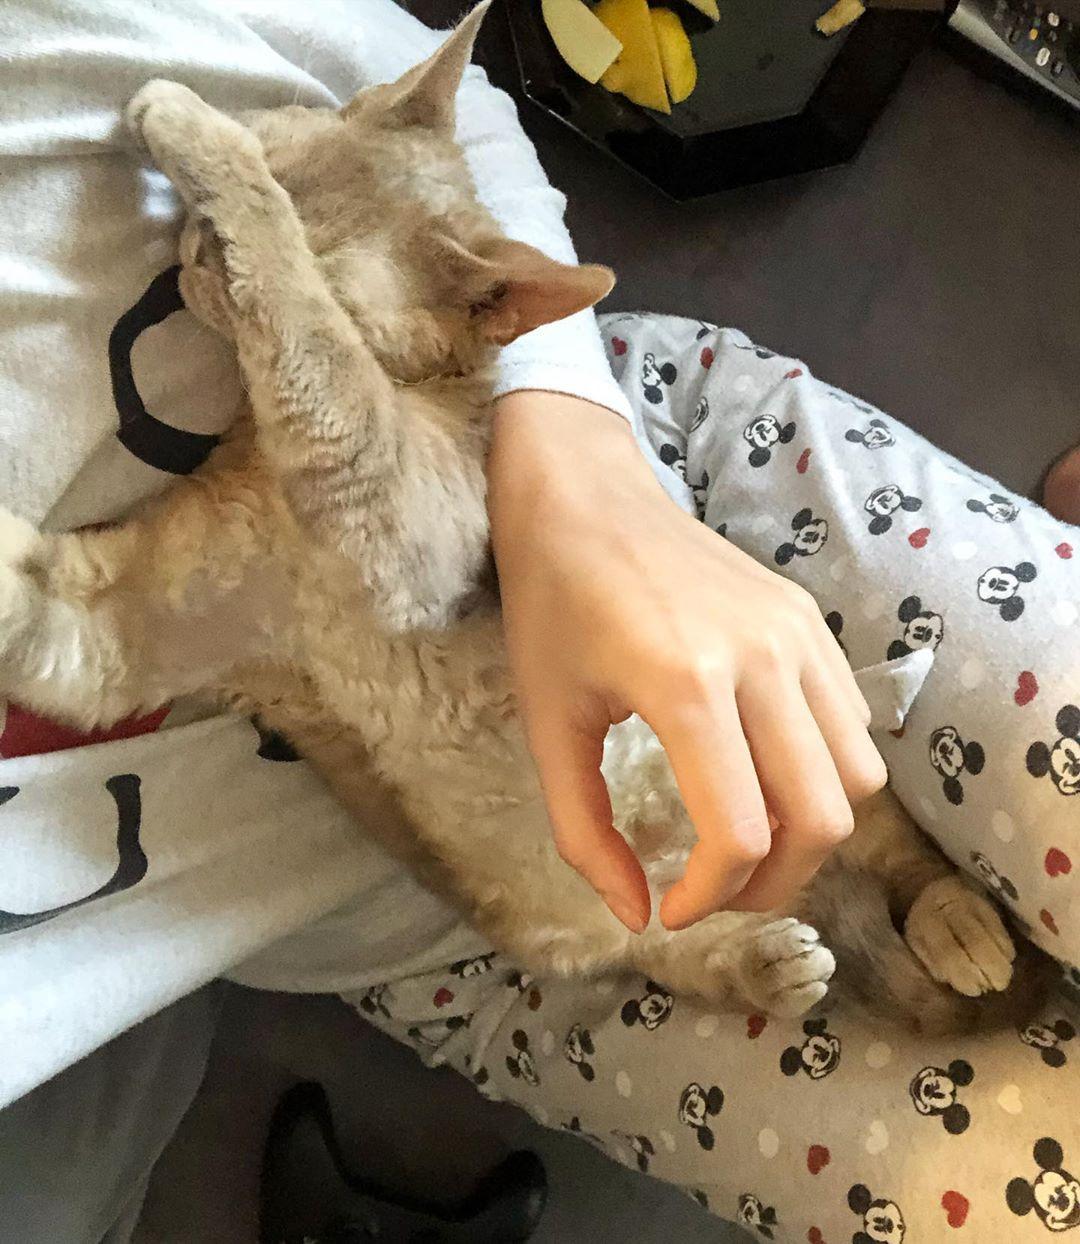 No photos please . . #devonrex #catsofinstagram #pets #catlovers #catslife #devonrexcat #devonlife #devonrexrules #devonrexlover #devonrexofinstagram #котики #девонрекс Instagram BridgeNo photos please ....